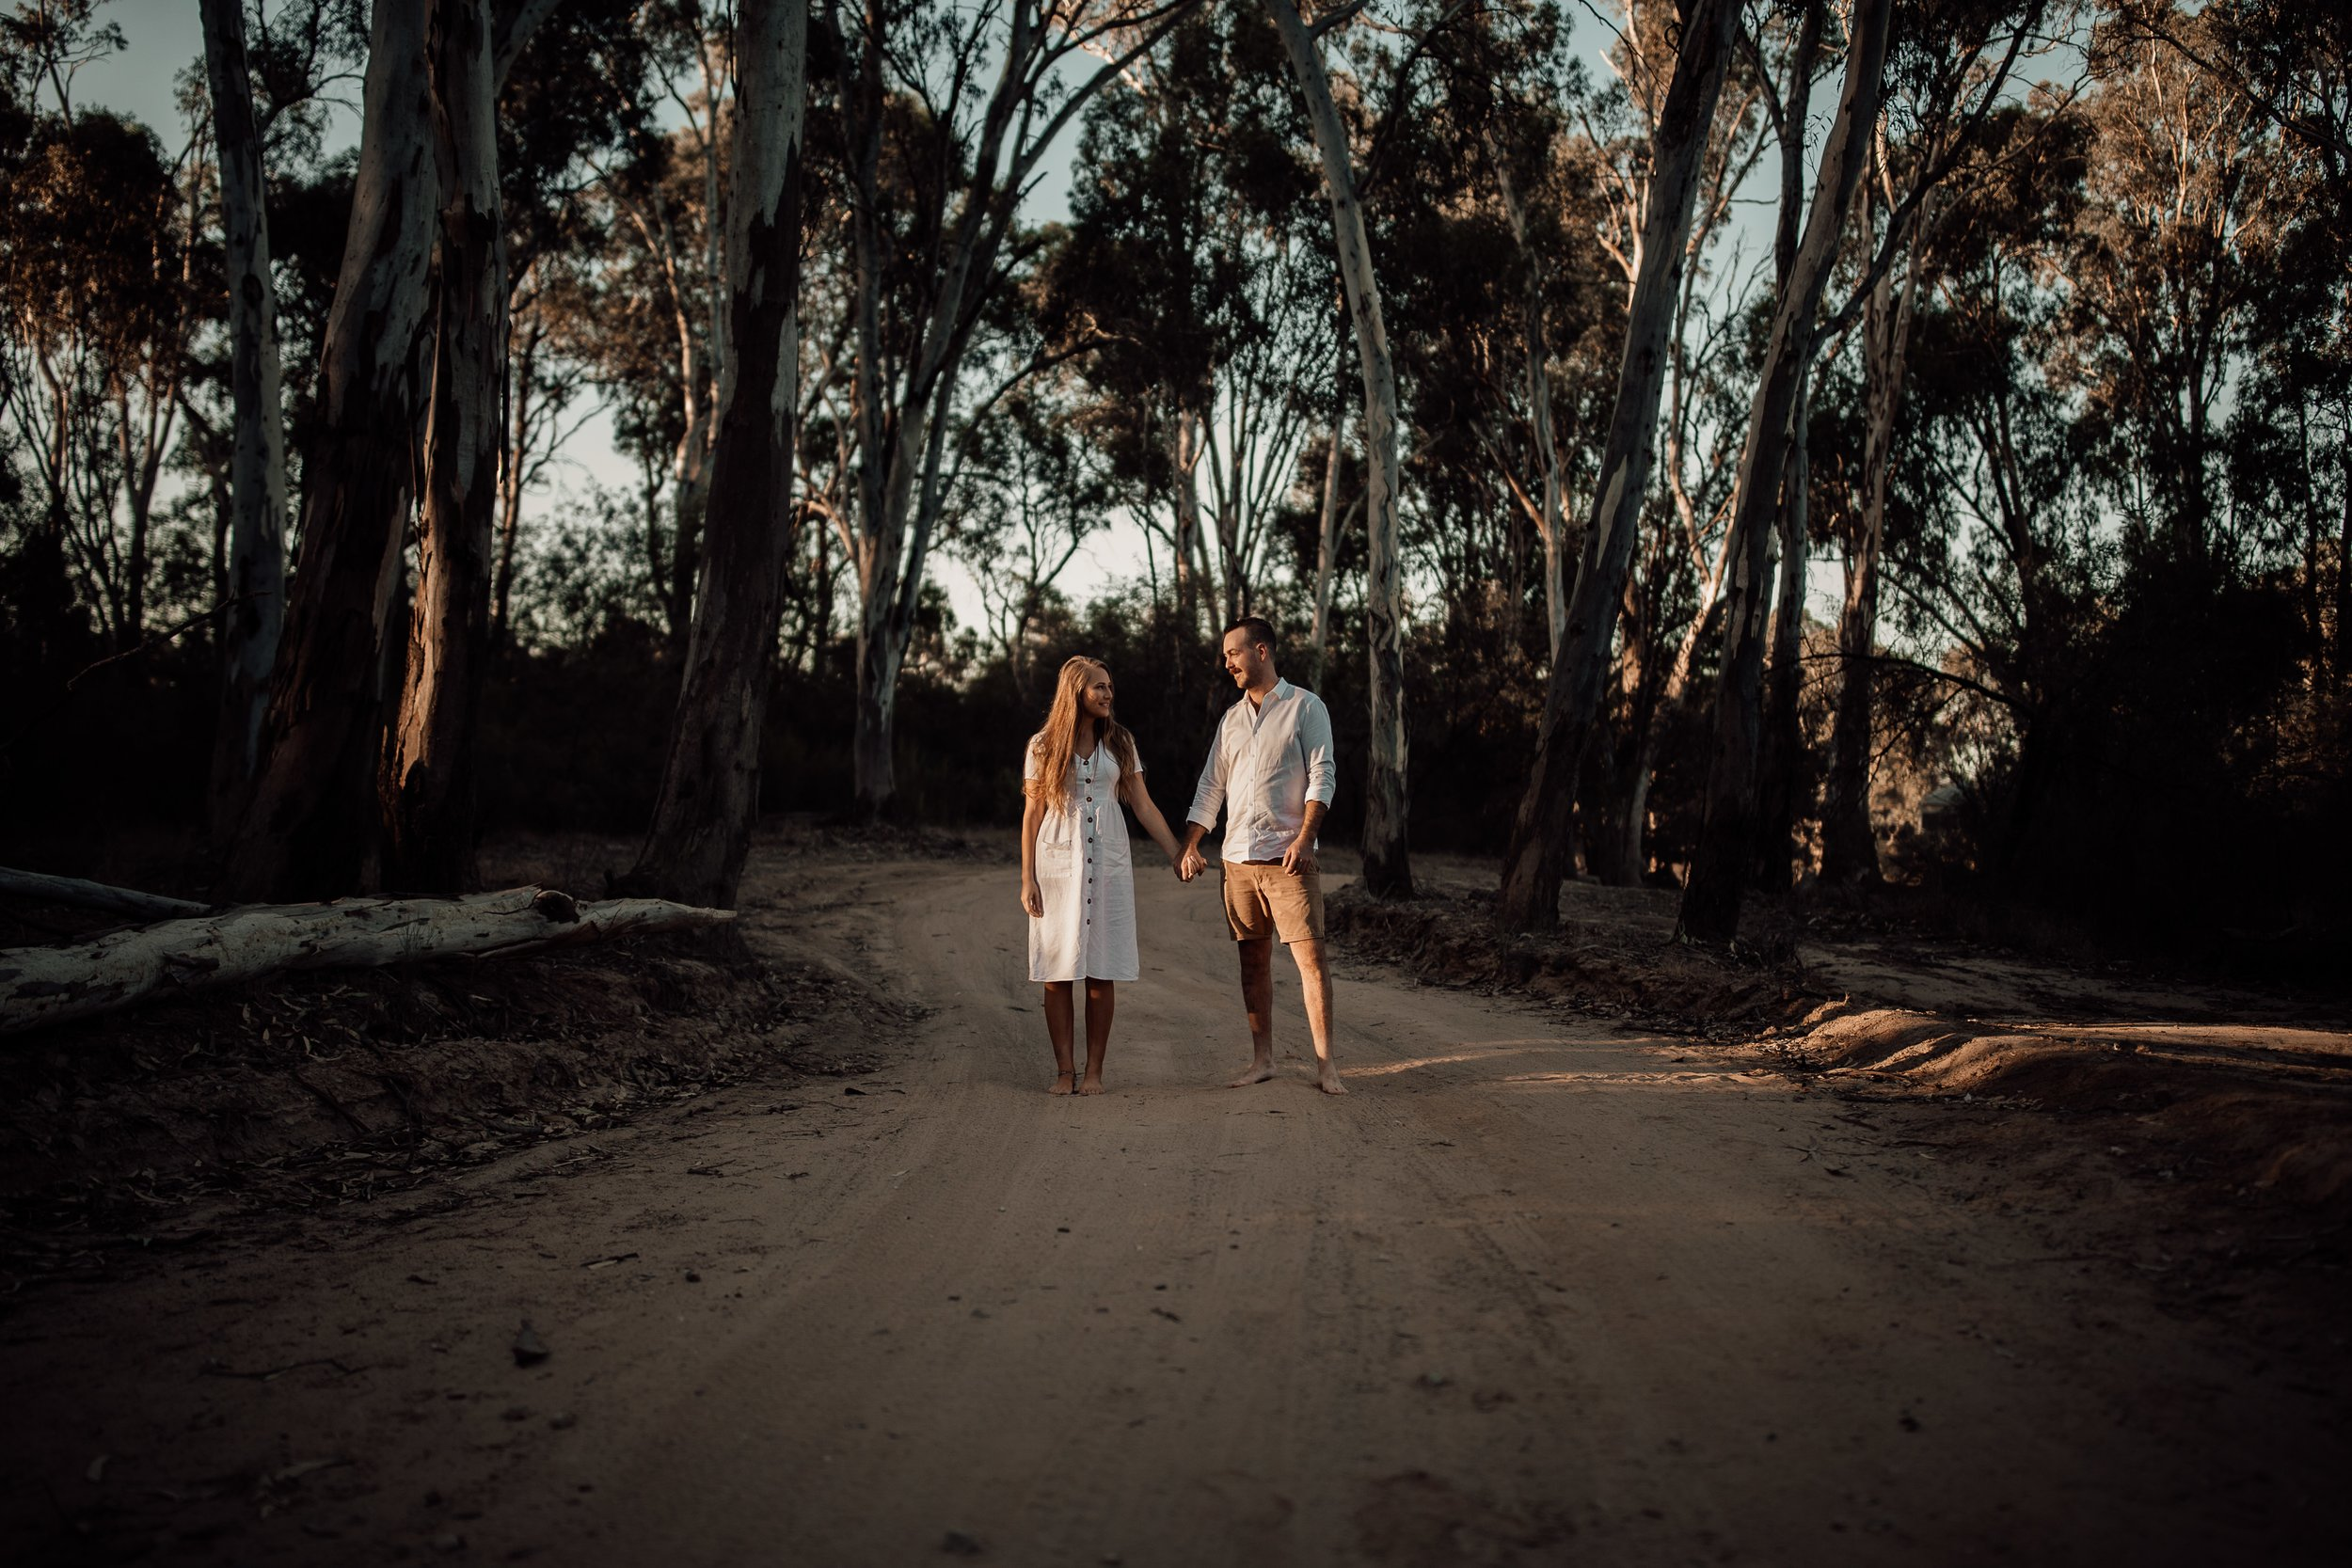 mickalathomas_puremacphotography_weddingphotographer_couplephotographer_Sheppartonphotographer_2815.jpg